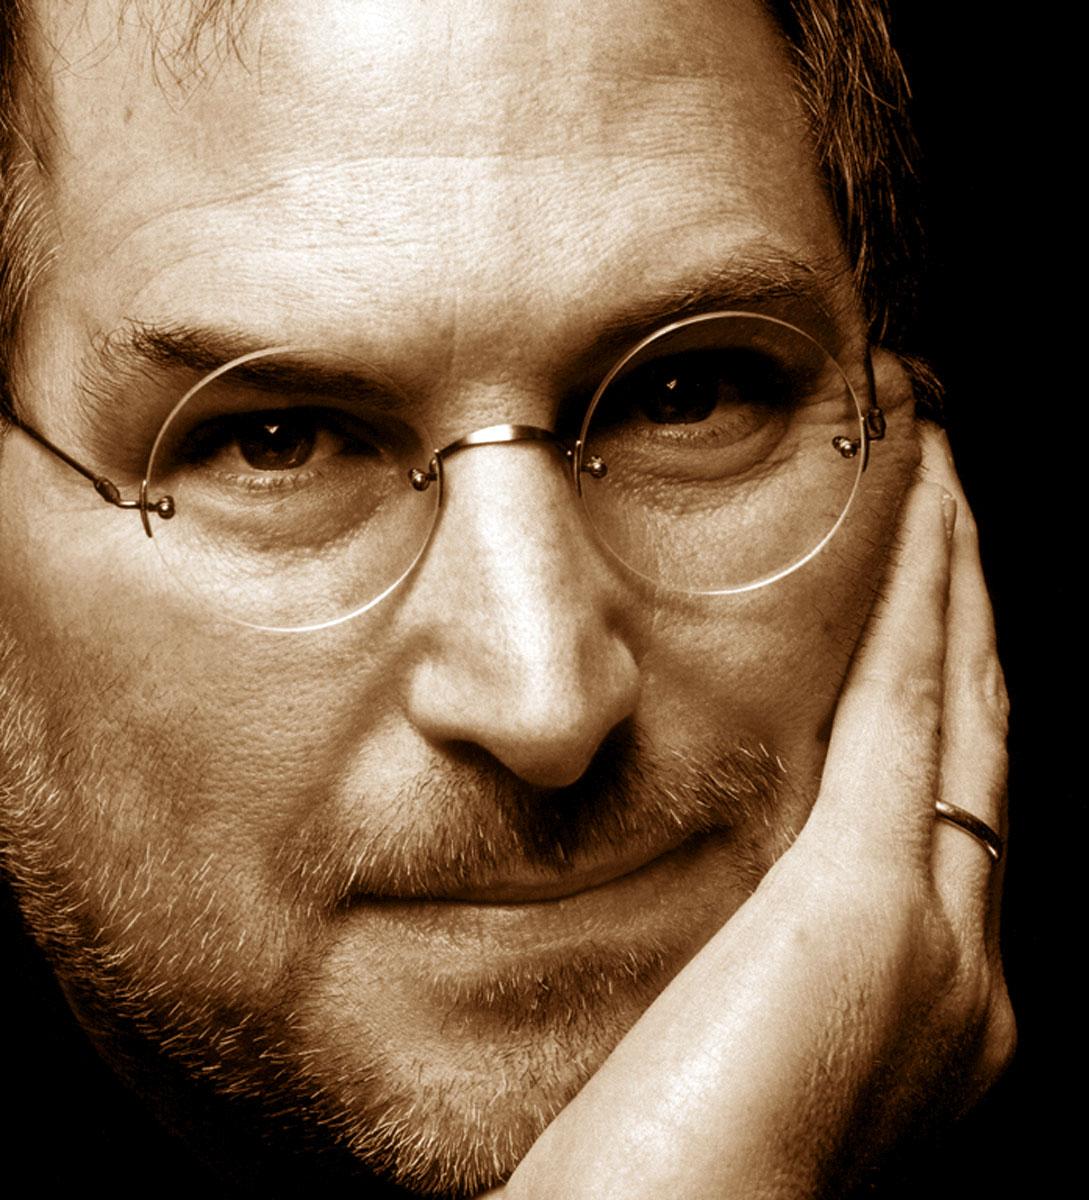 Foto di Steve Jobs